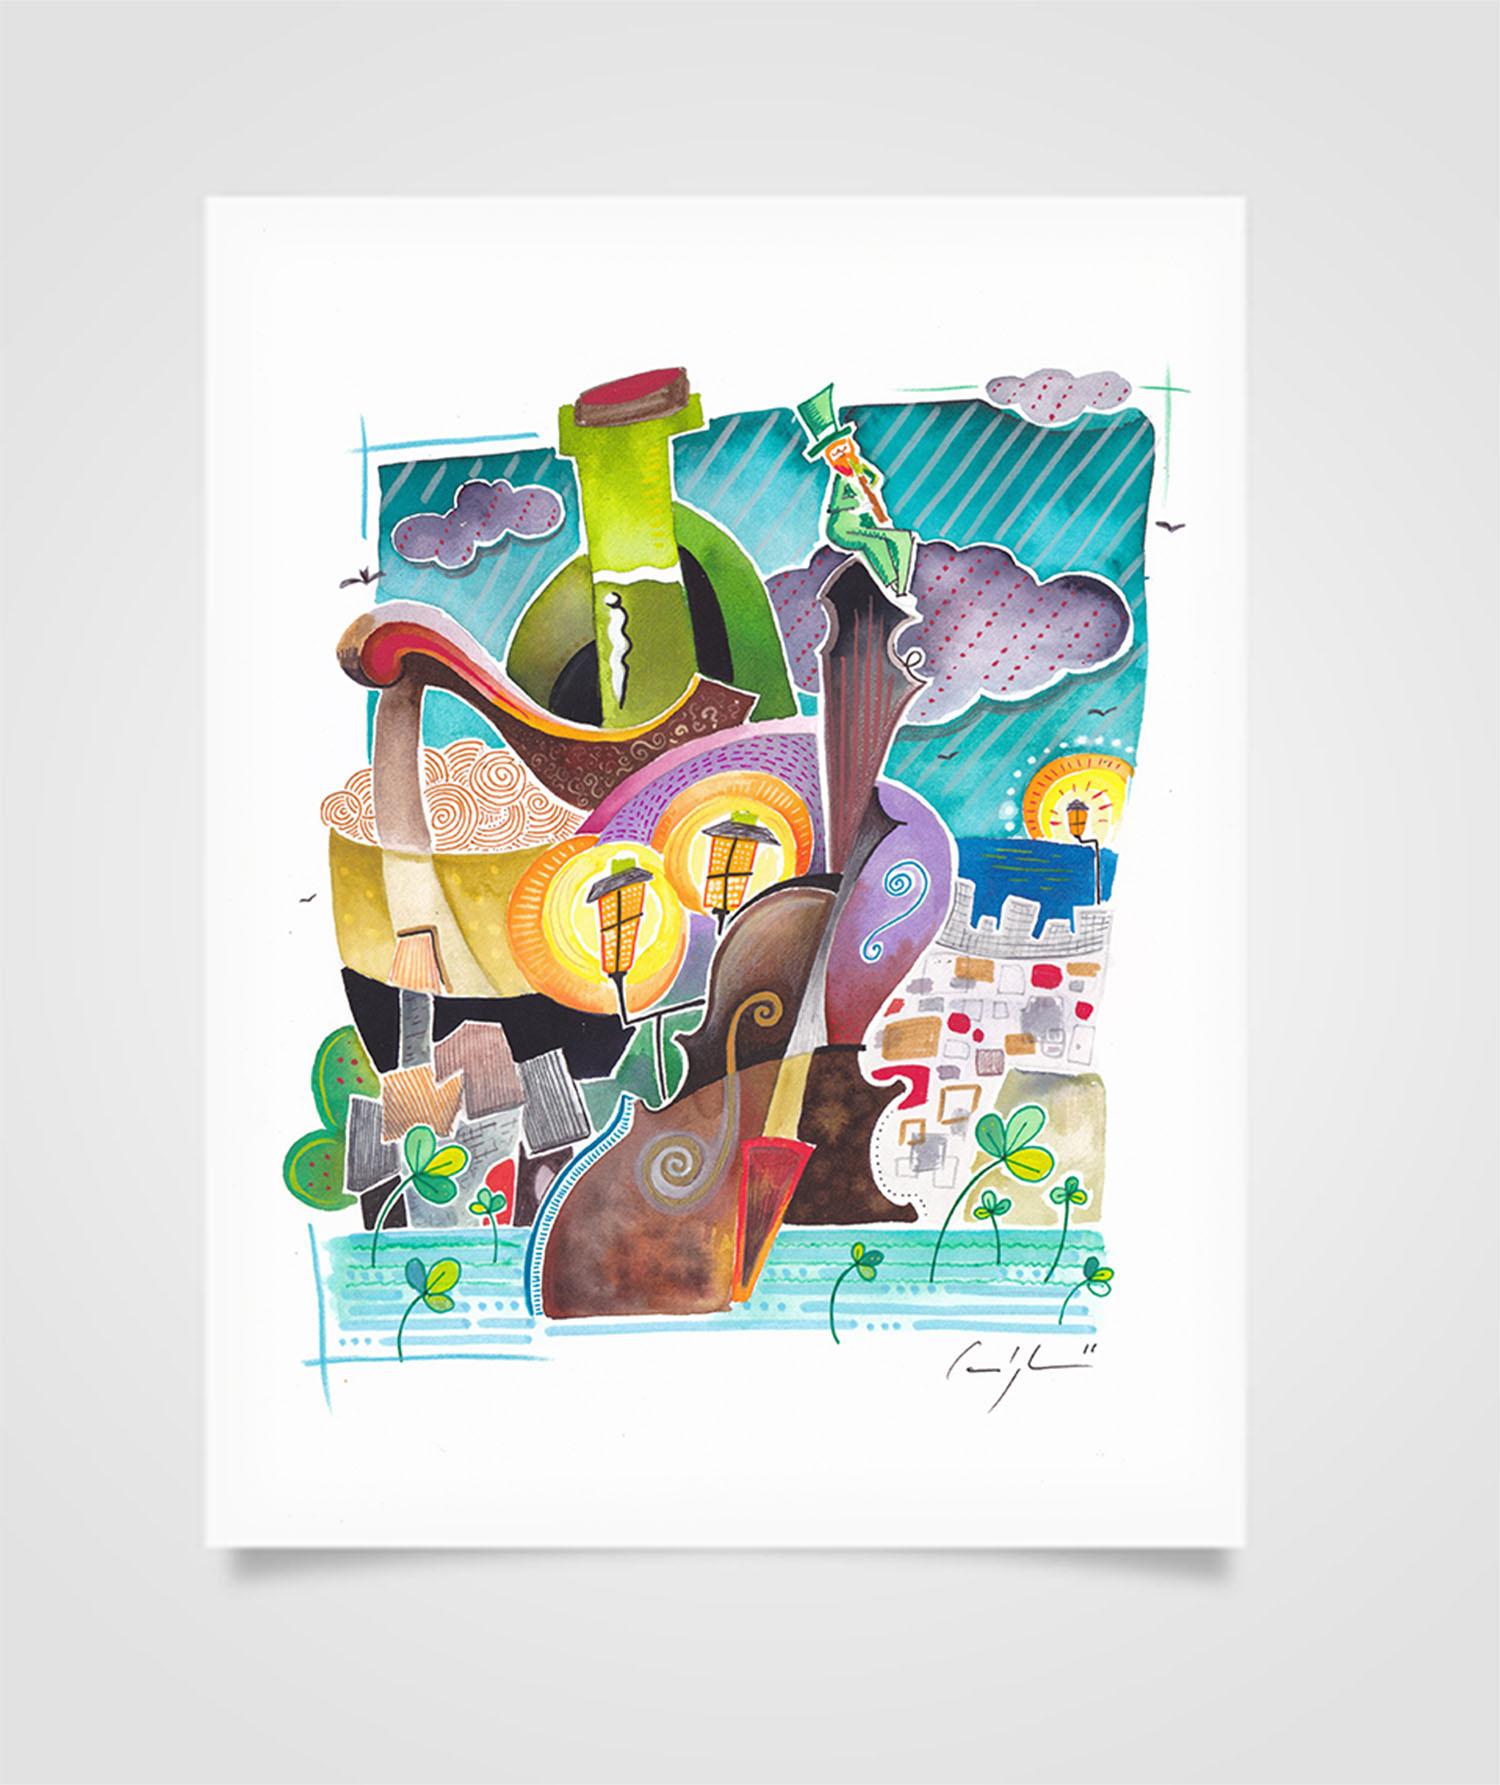 """Eire - Passeggiata a Galway"" Tecniche miste su carta, 21 x 29,7 cm (2016)"